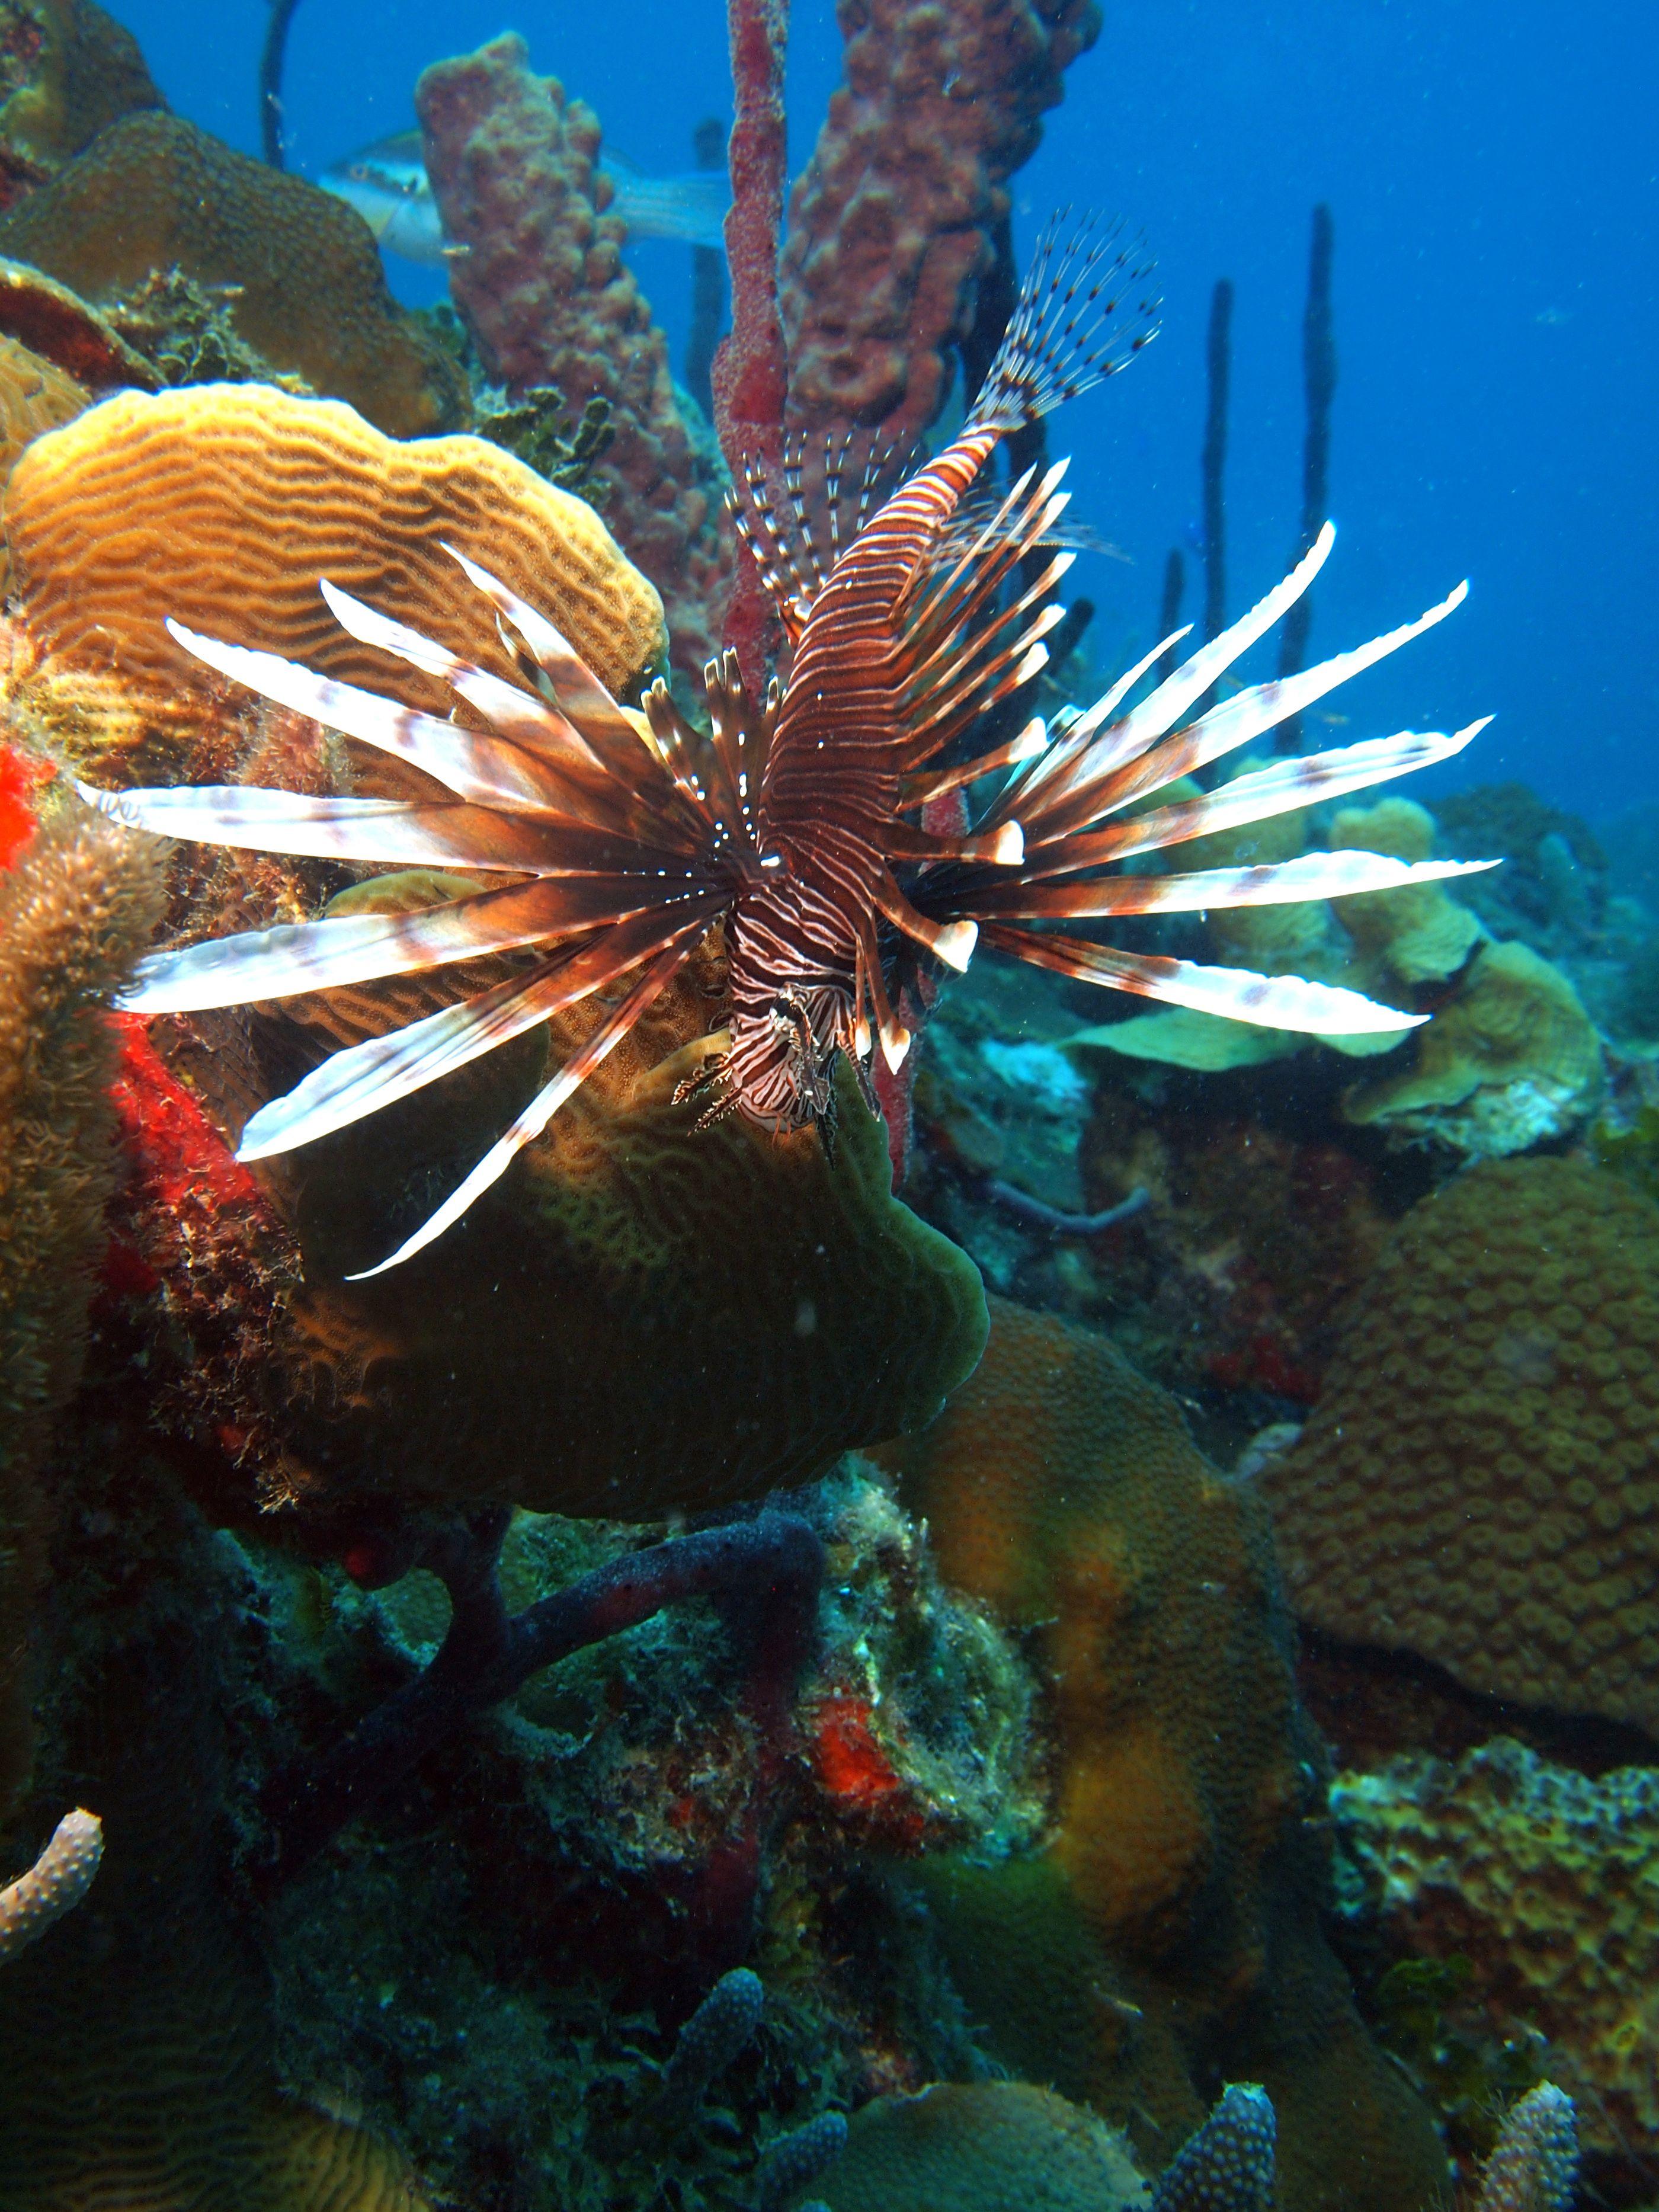 Fish tank kings a snorkelers dream - Fish